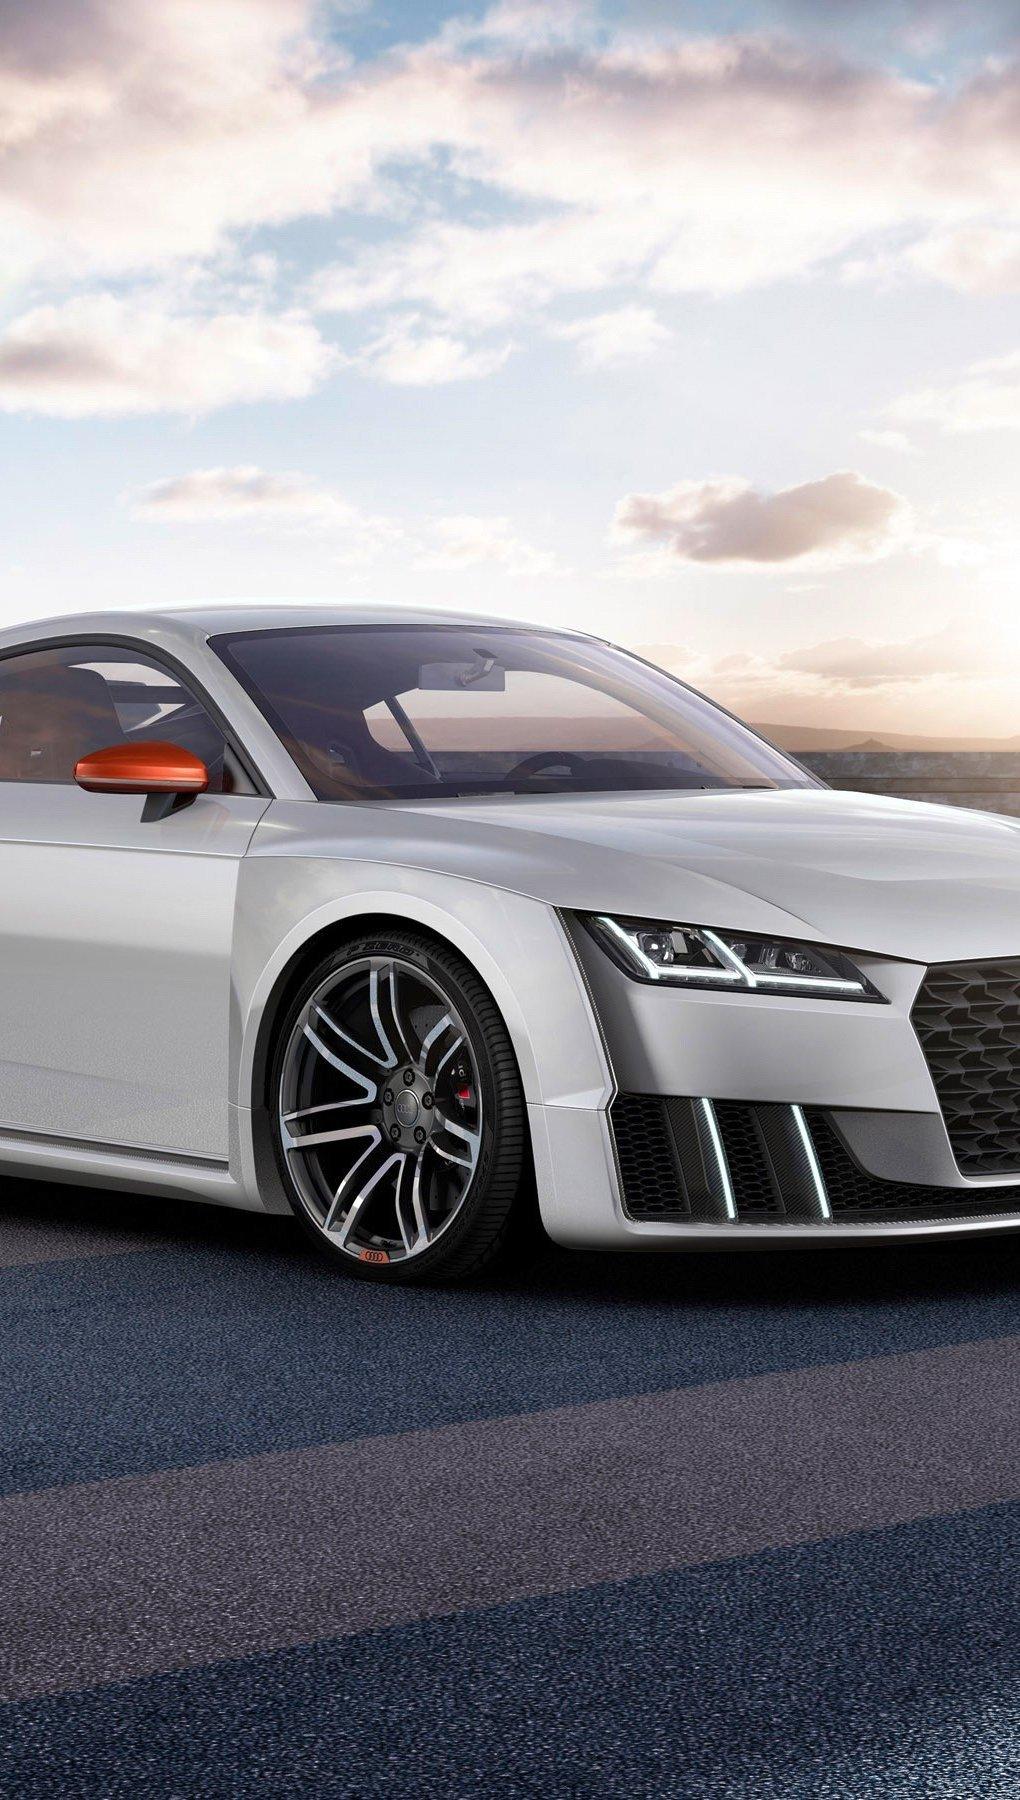 Wallpaper Auto Audi TT Clubsport Turbo Concept Vertical